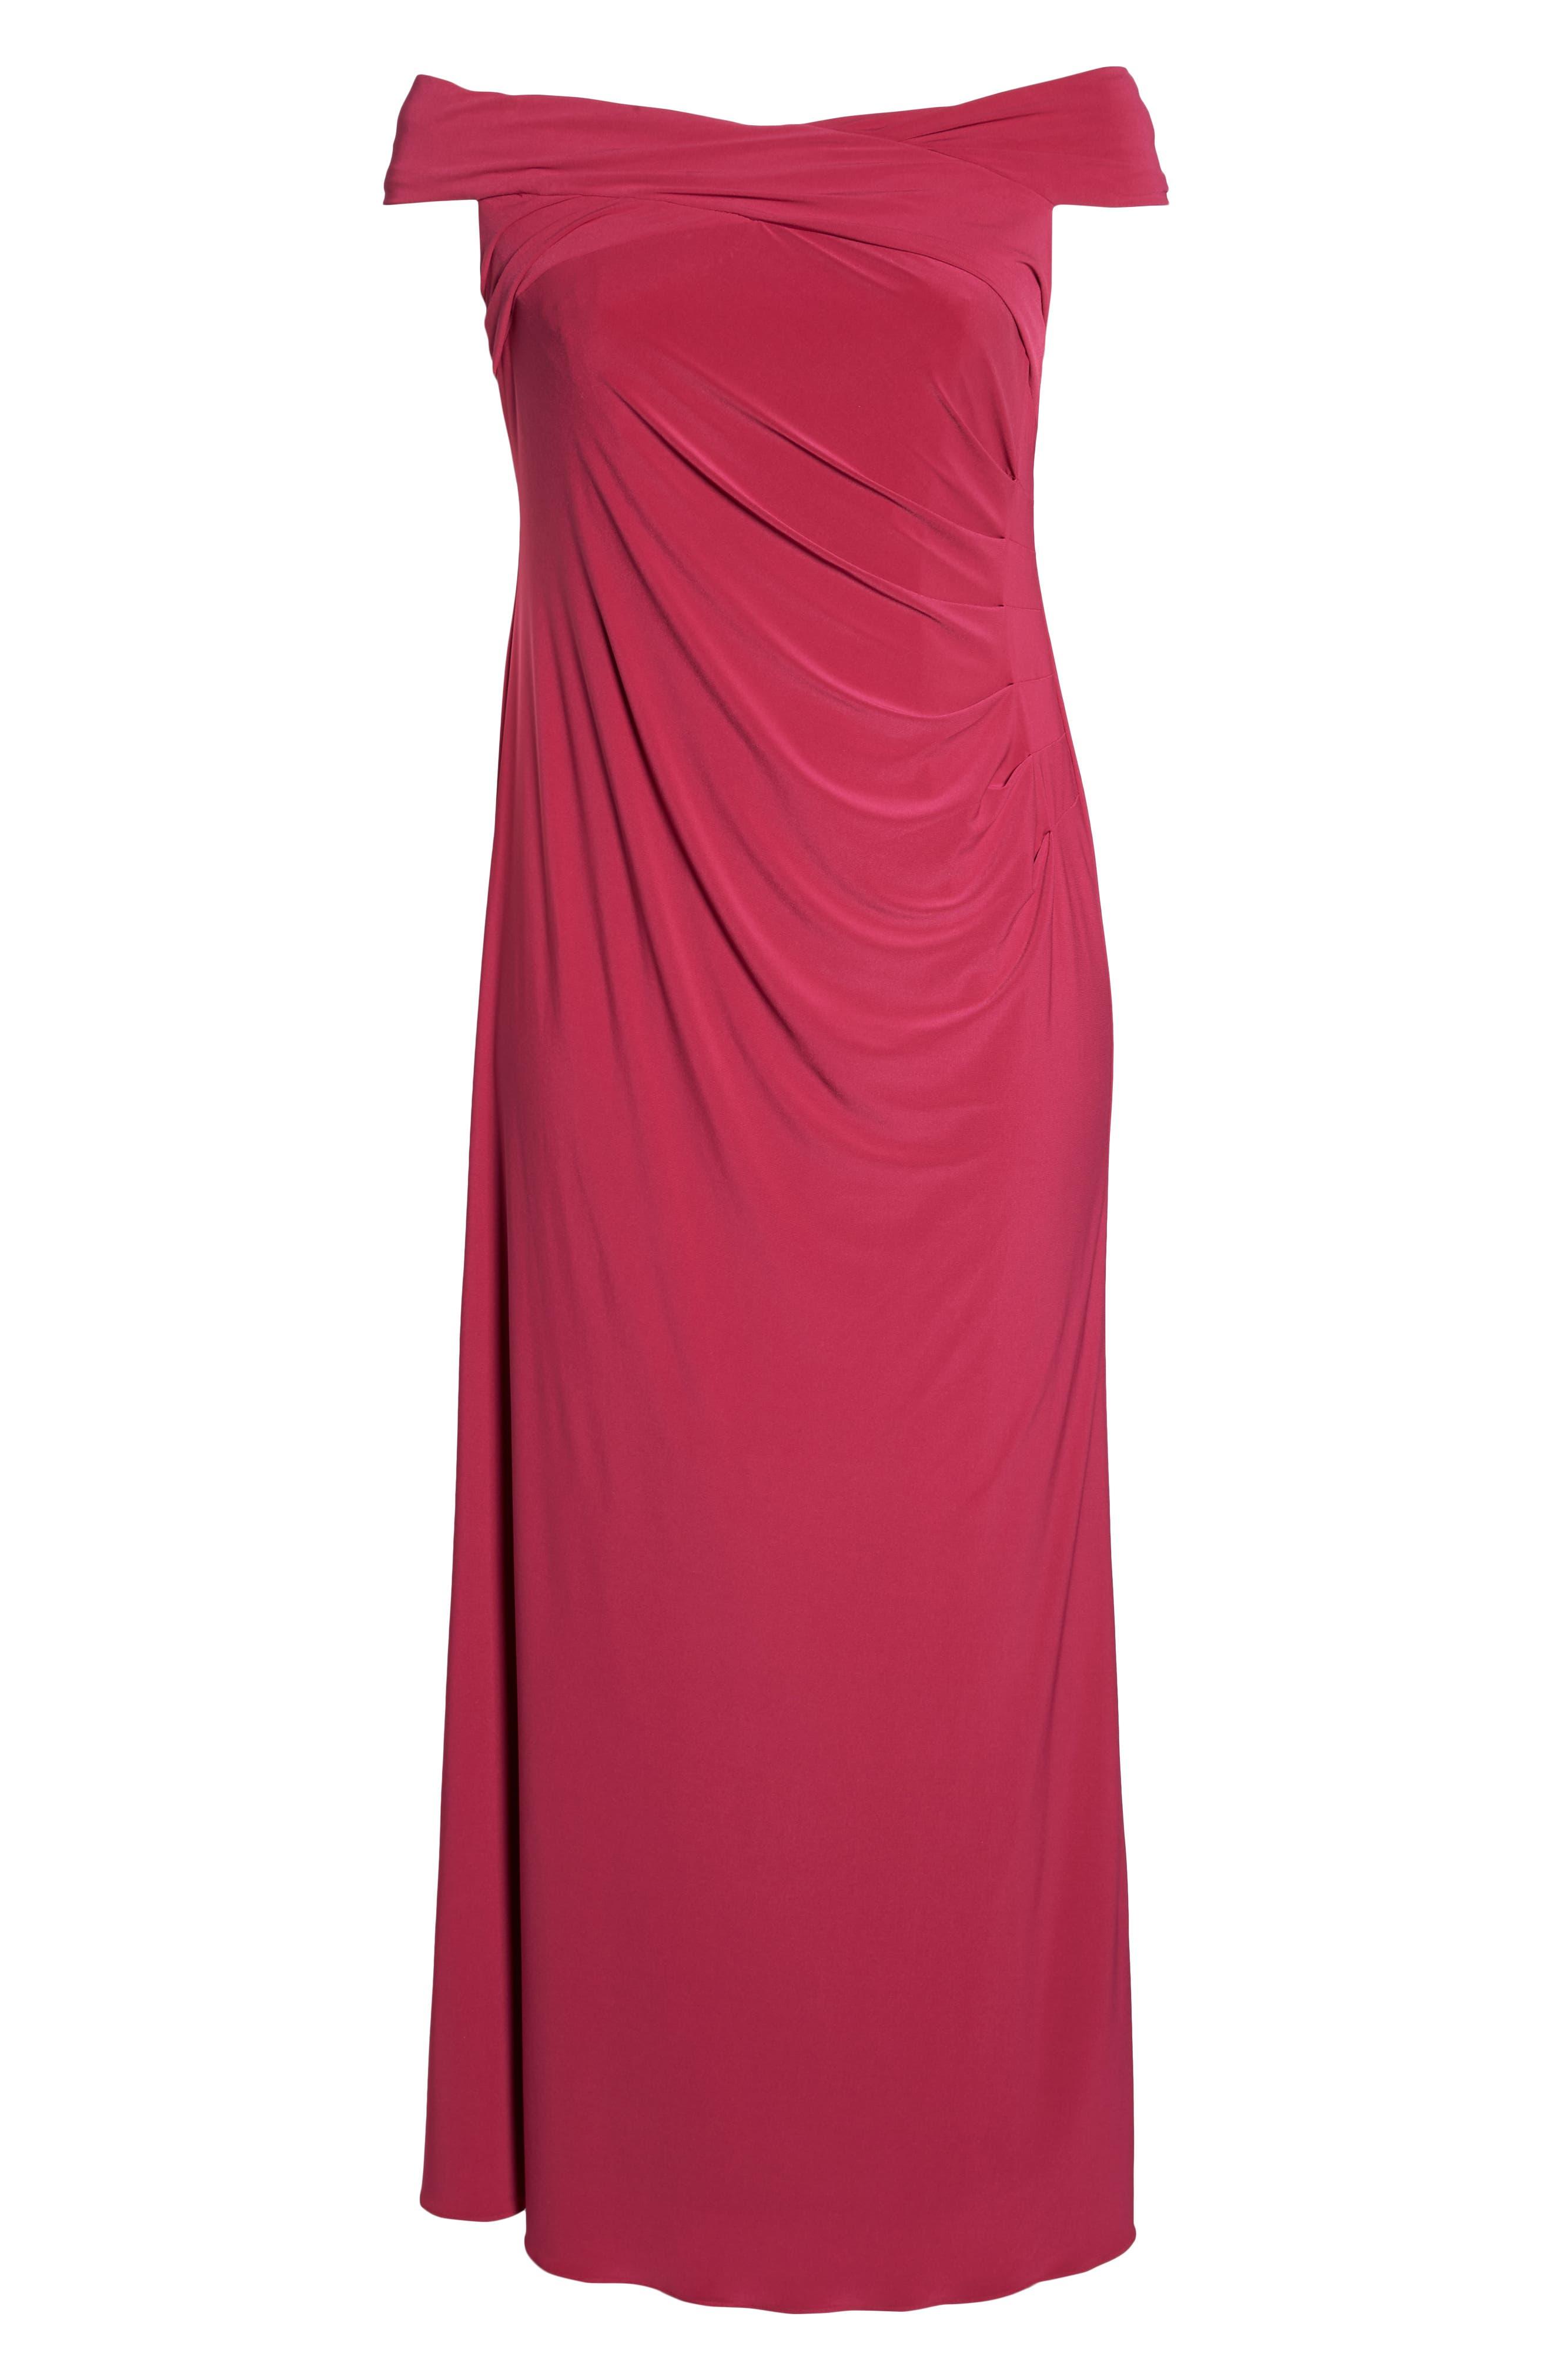 Off the Shoulder Jersey Dress,                             Alternate thumbnail 6, color,                             Bright Syrah